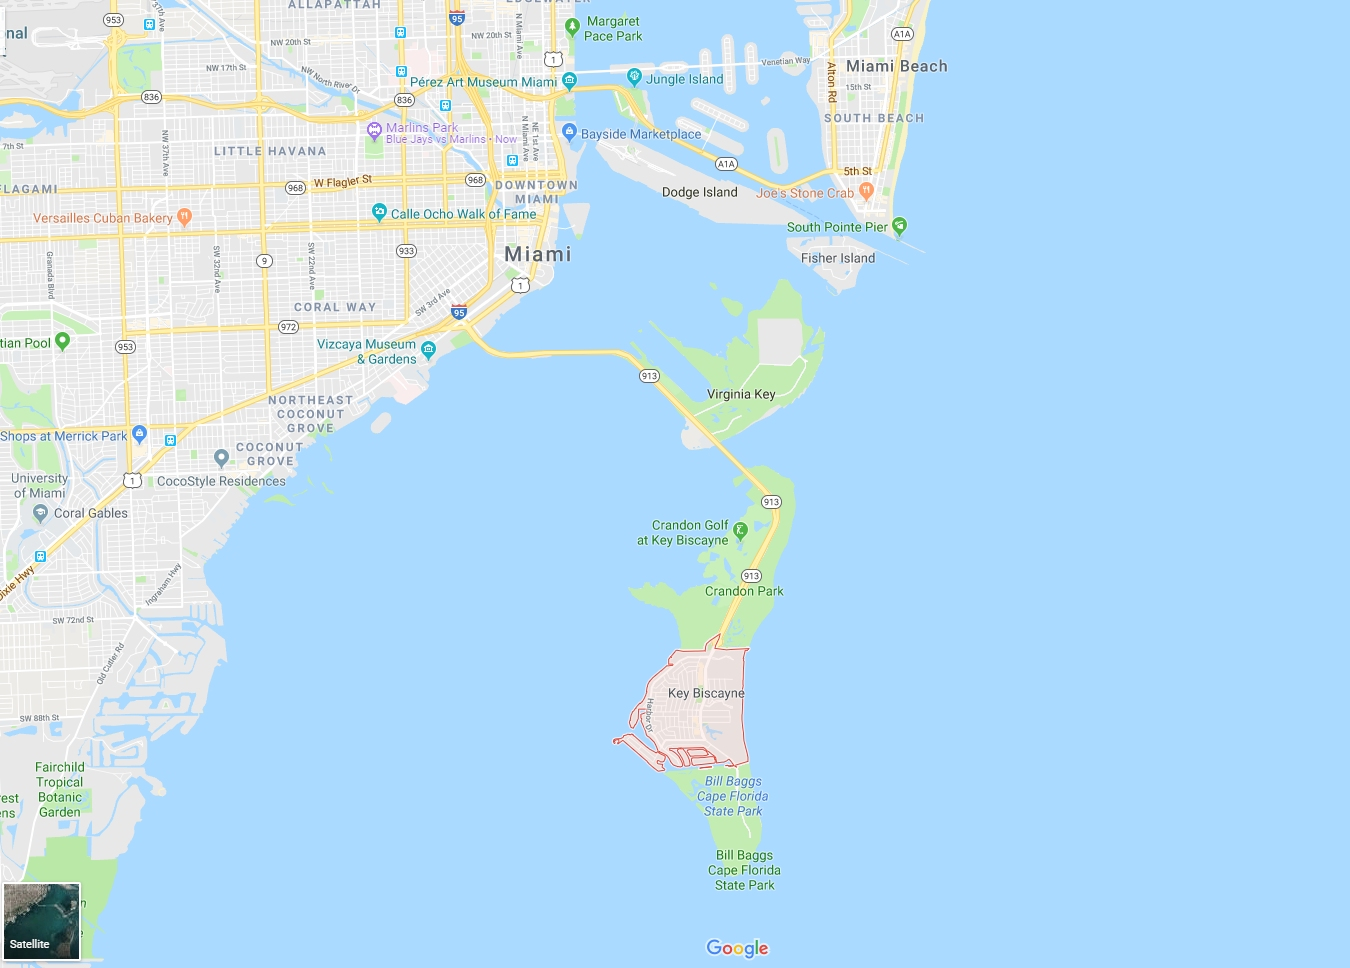 Key Biscayne Map